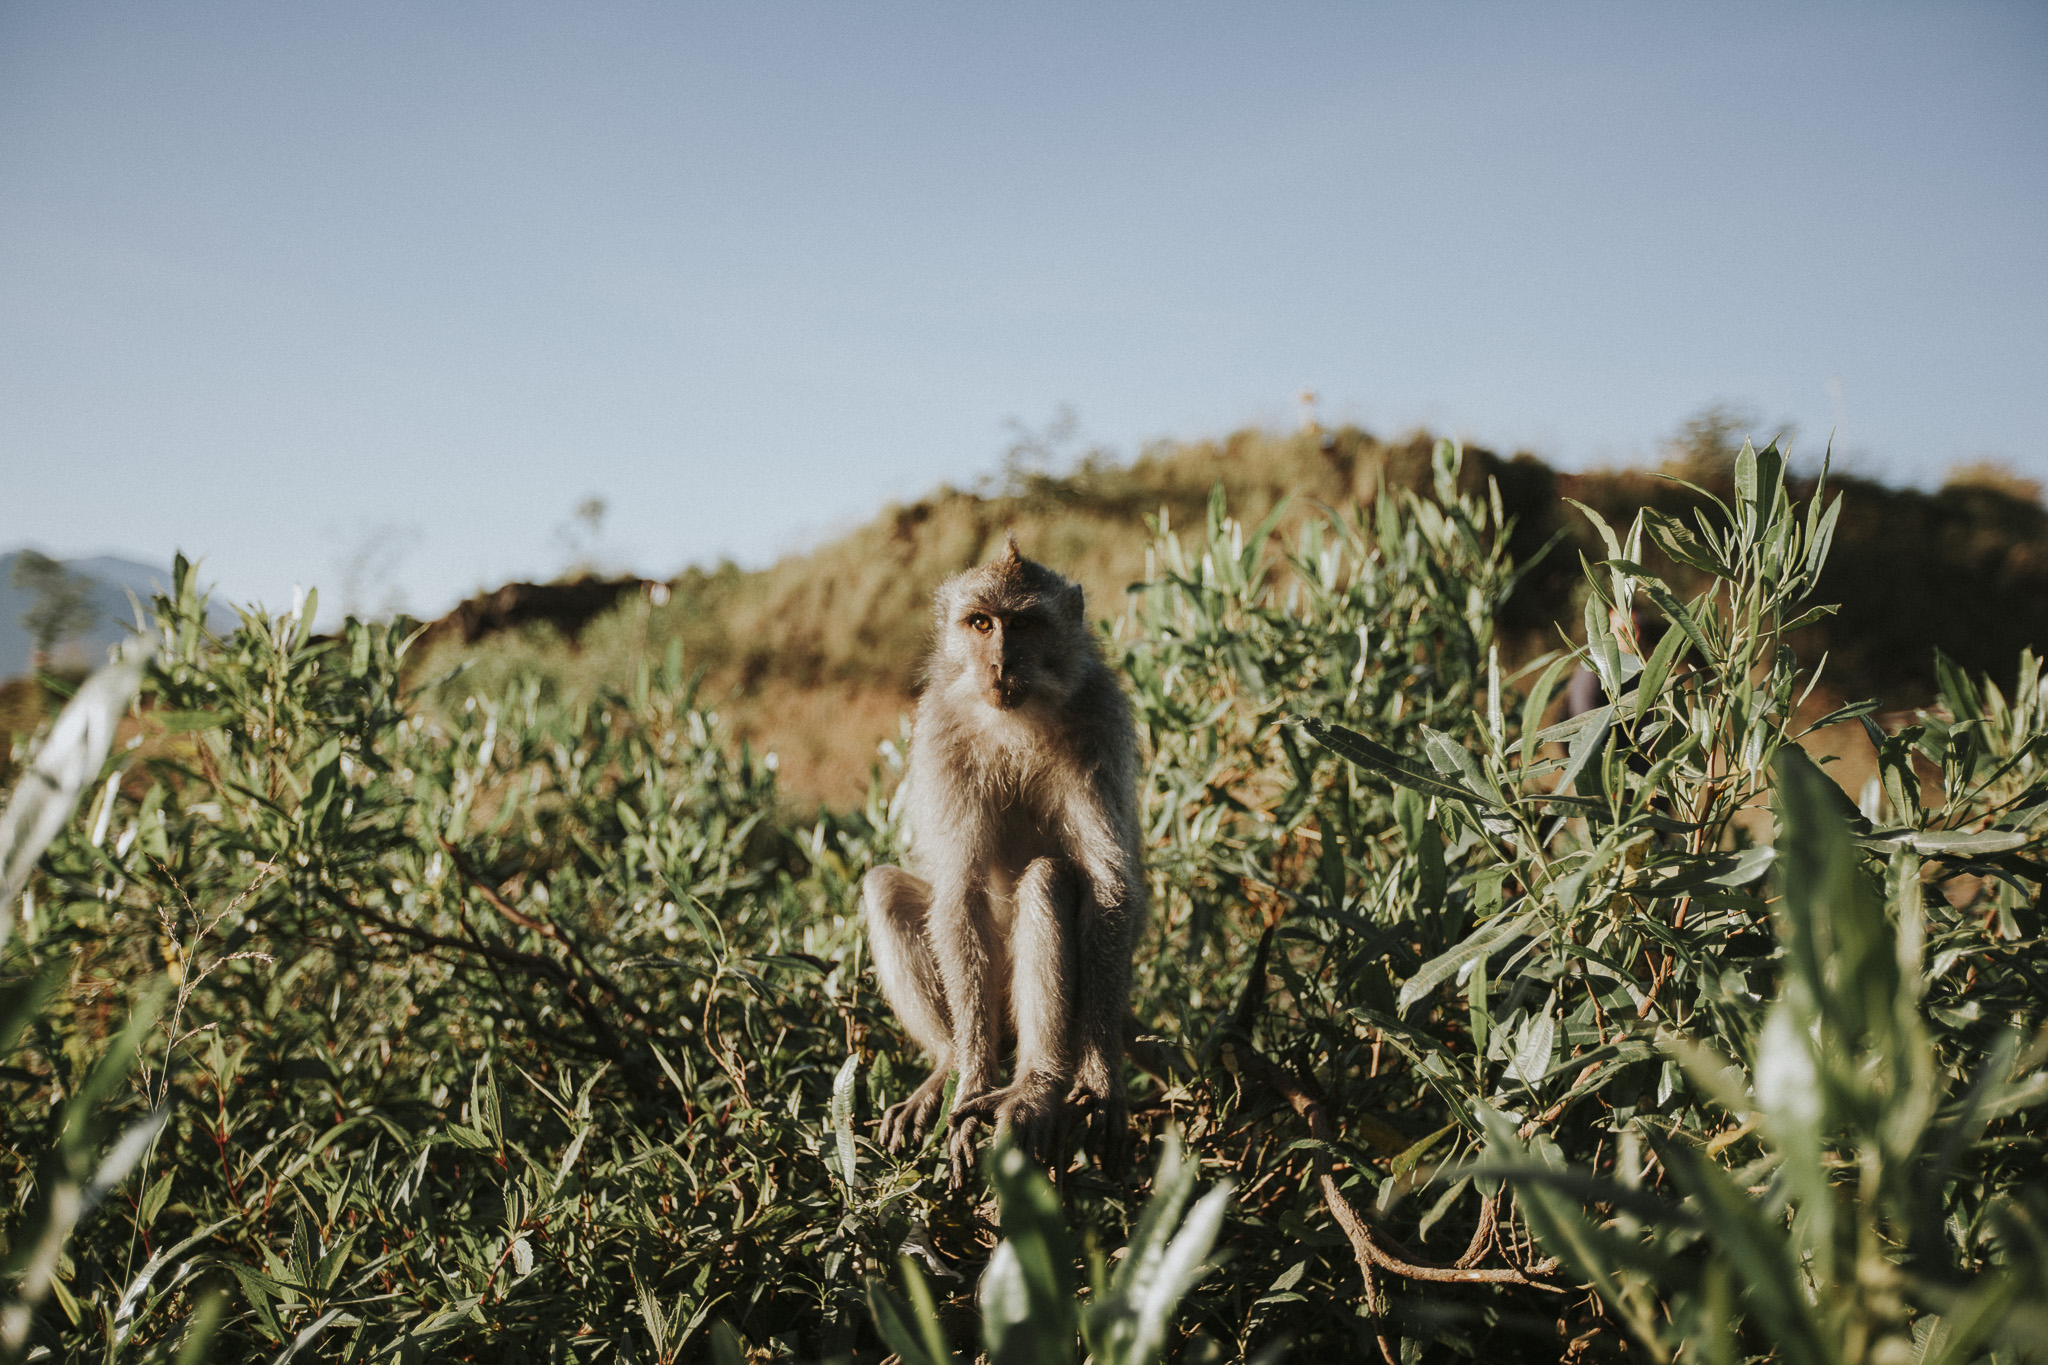 Bali Monkey on Mount Batur